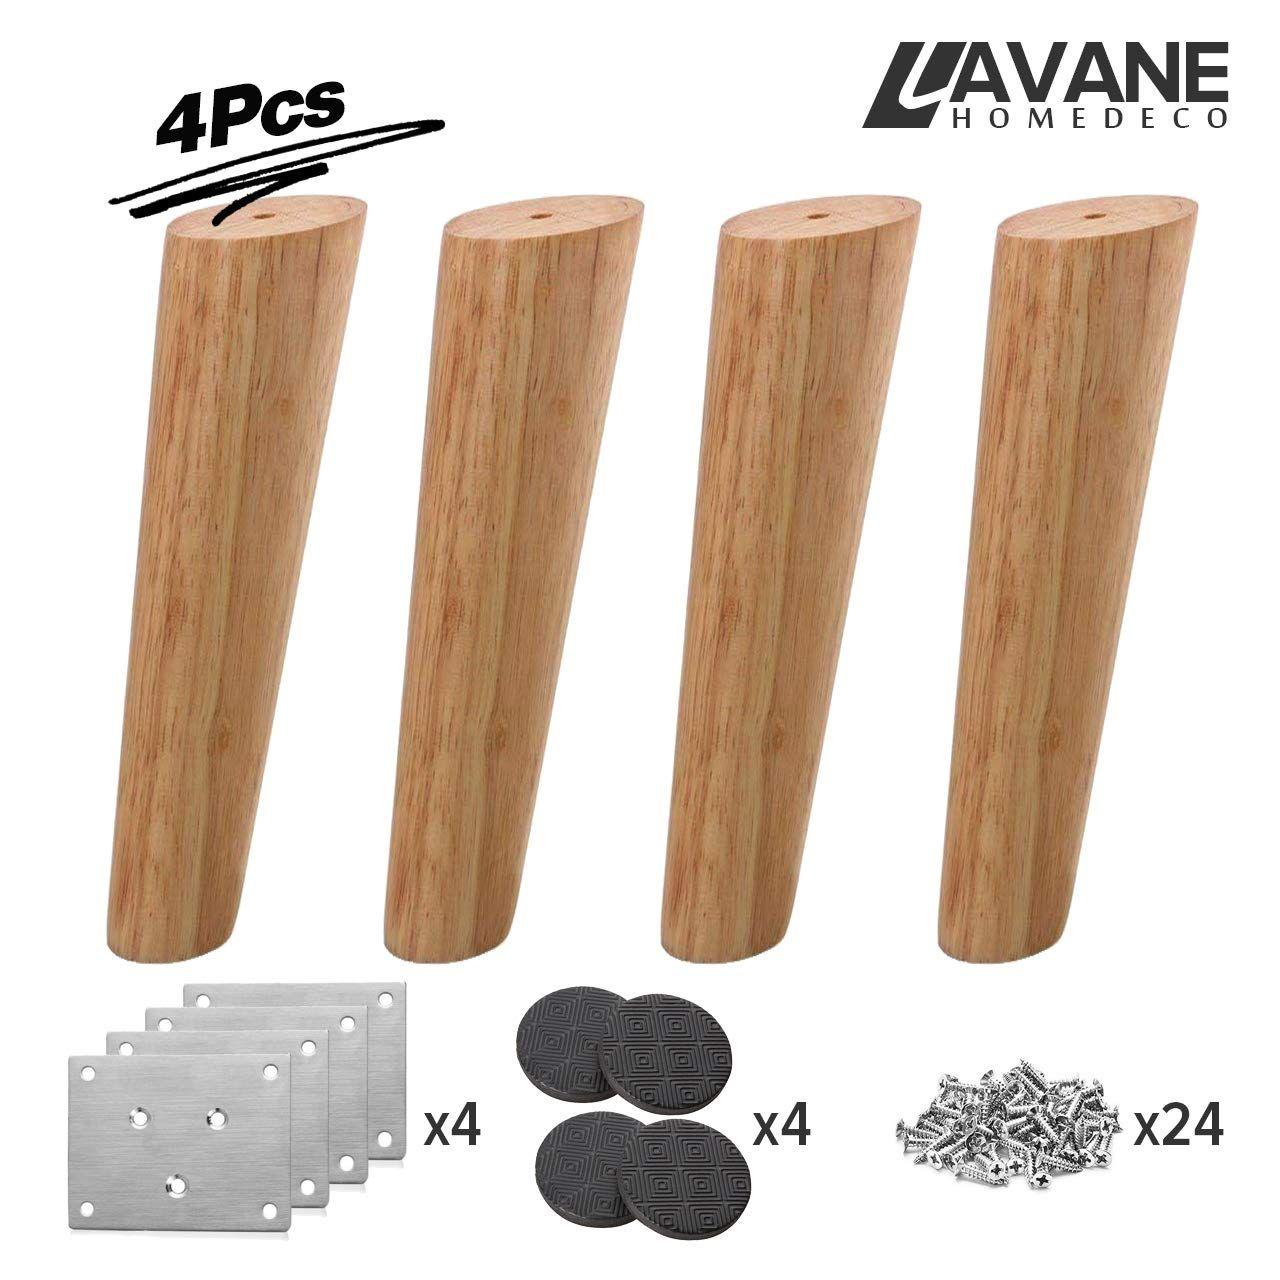 20 inch 50cm wooden furniture legs la vane set of 4